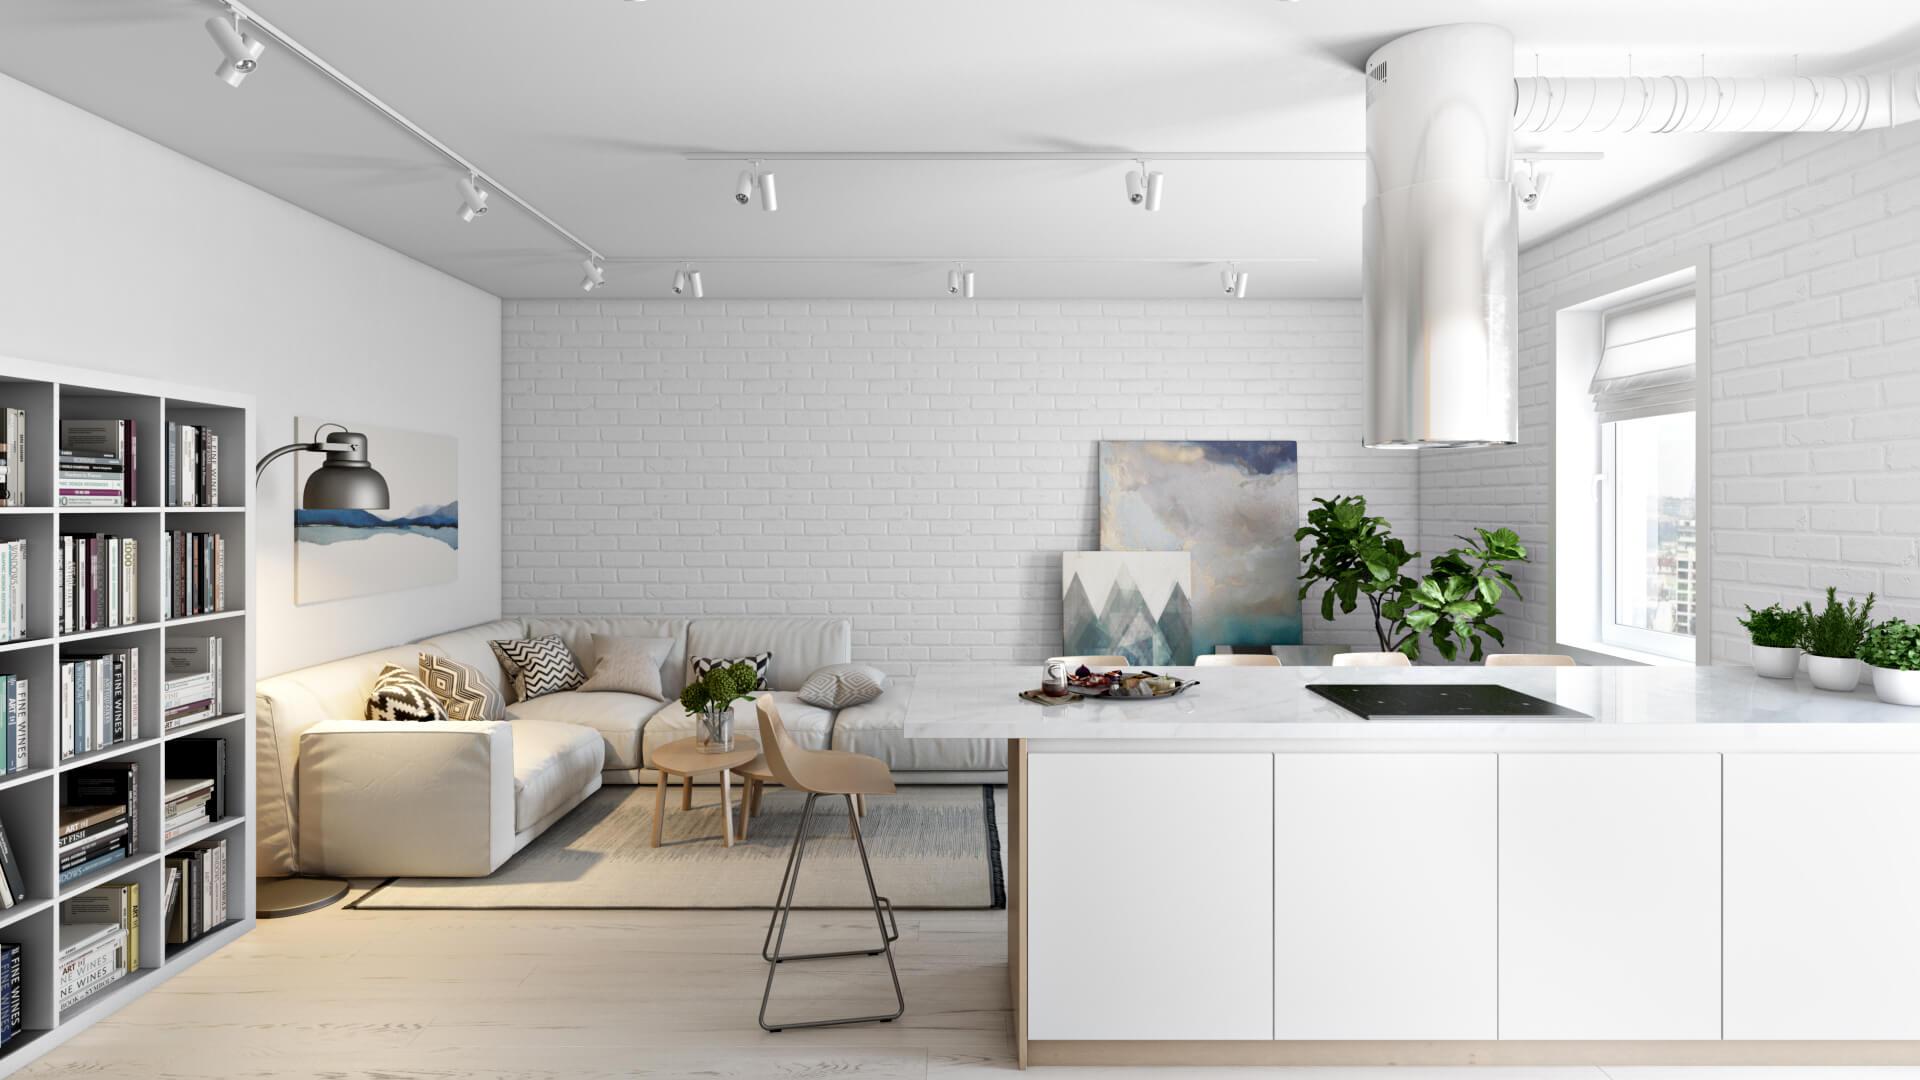 email marketing for interior designers near me